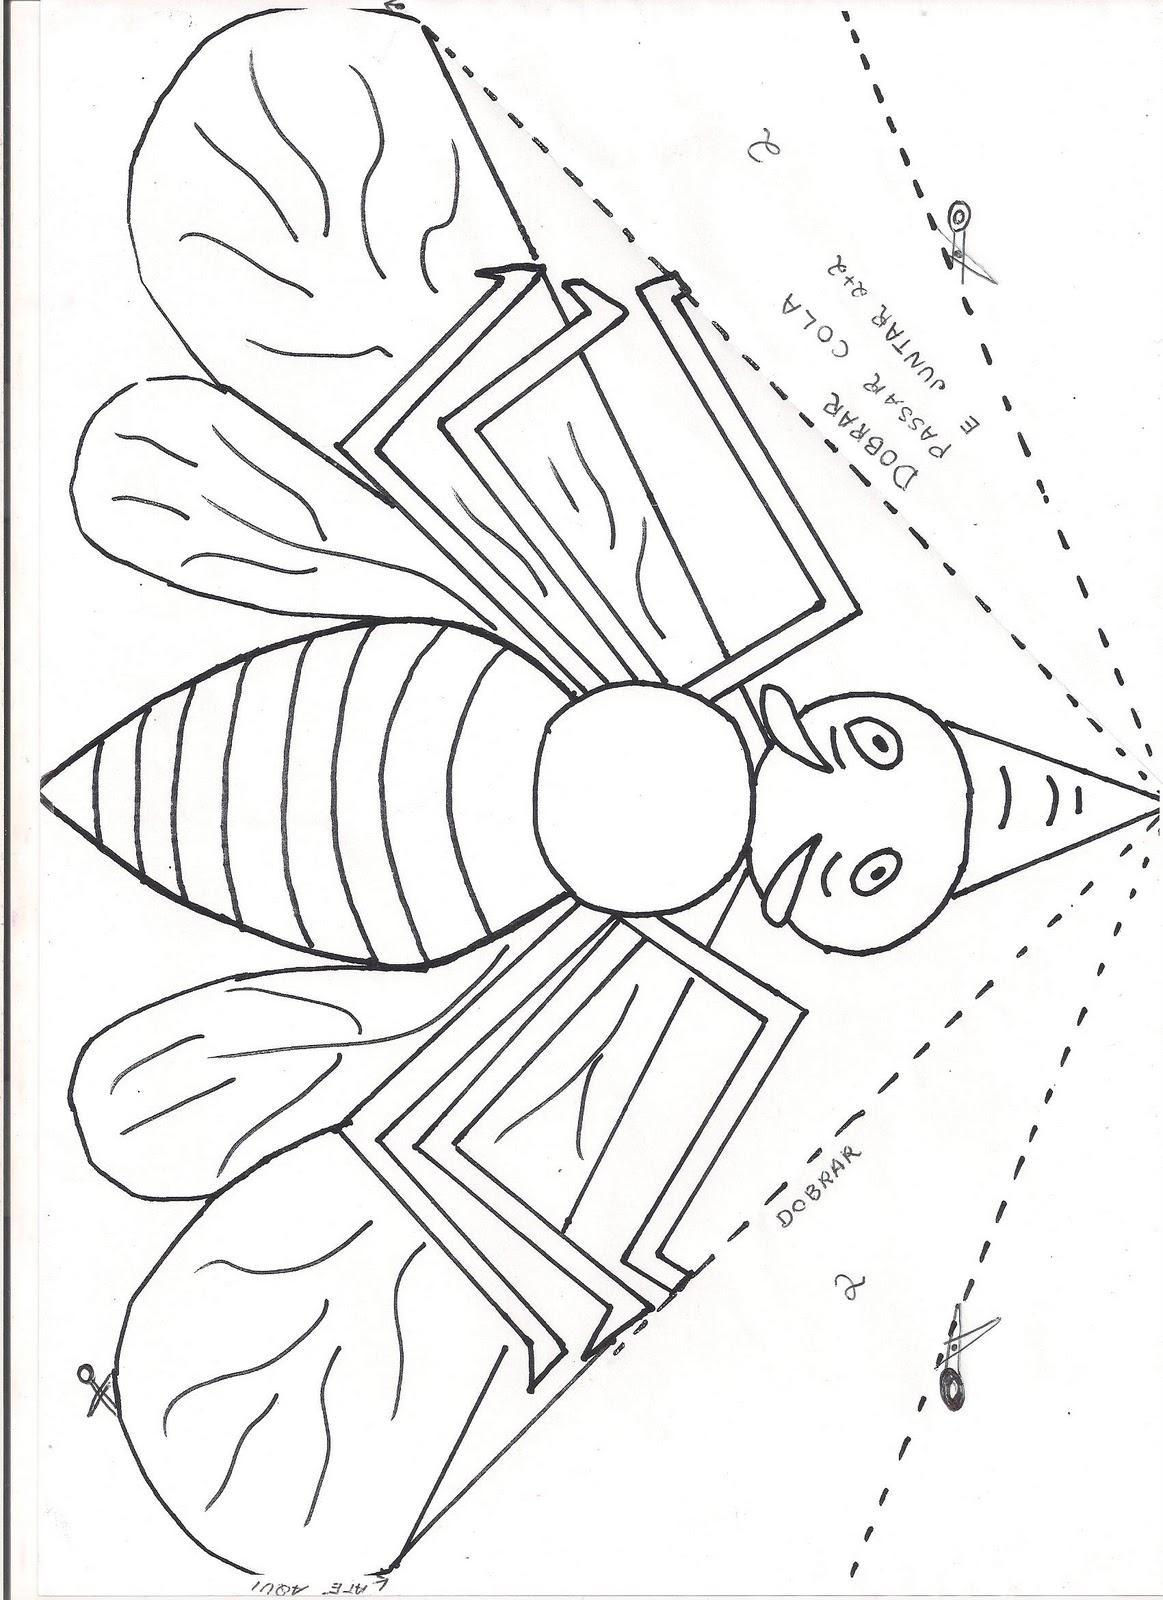 Dengue Fever Worksheet